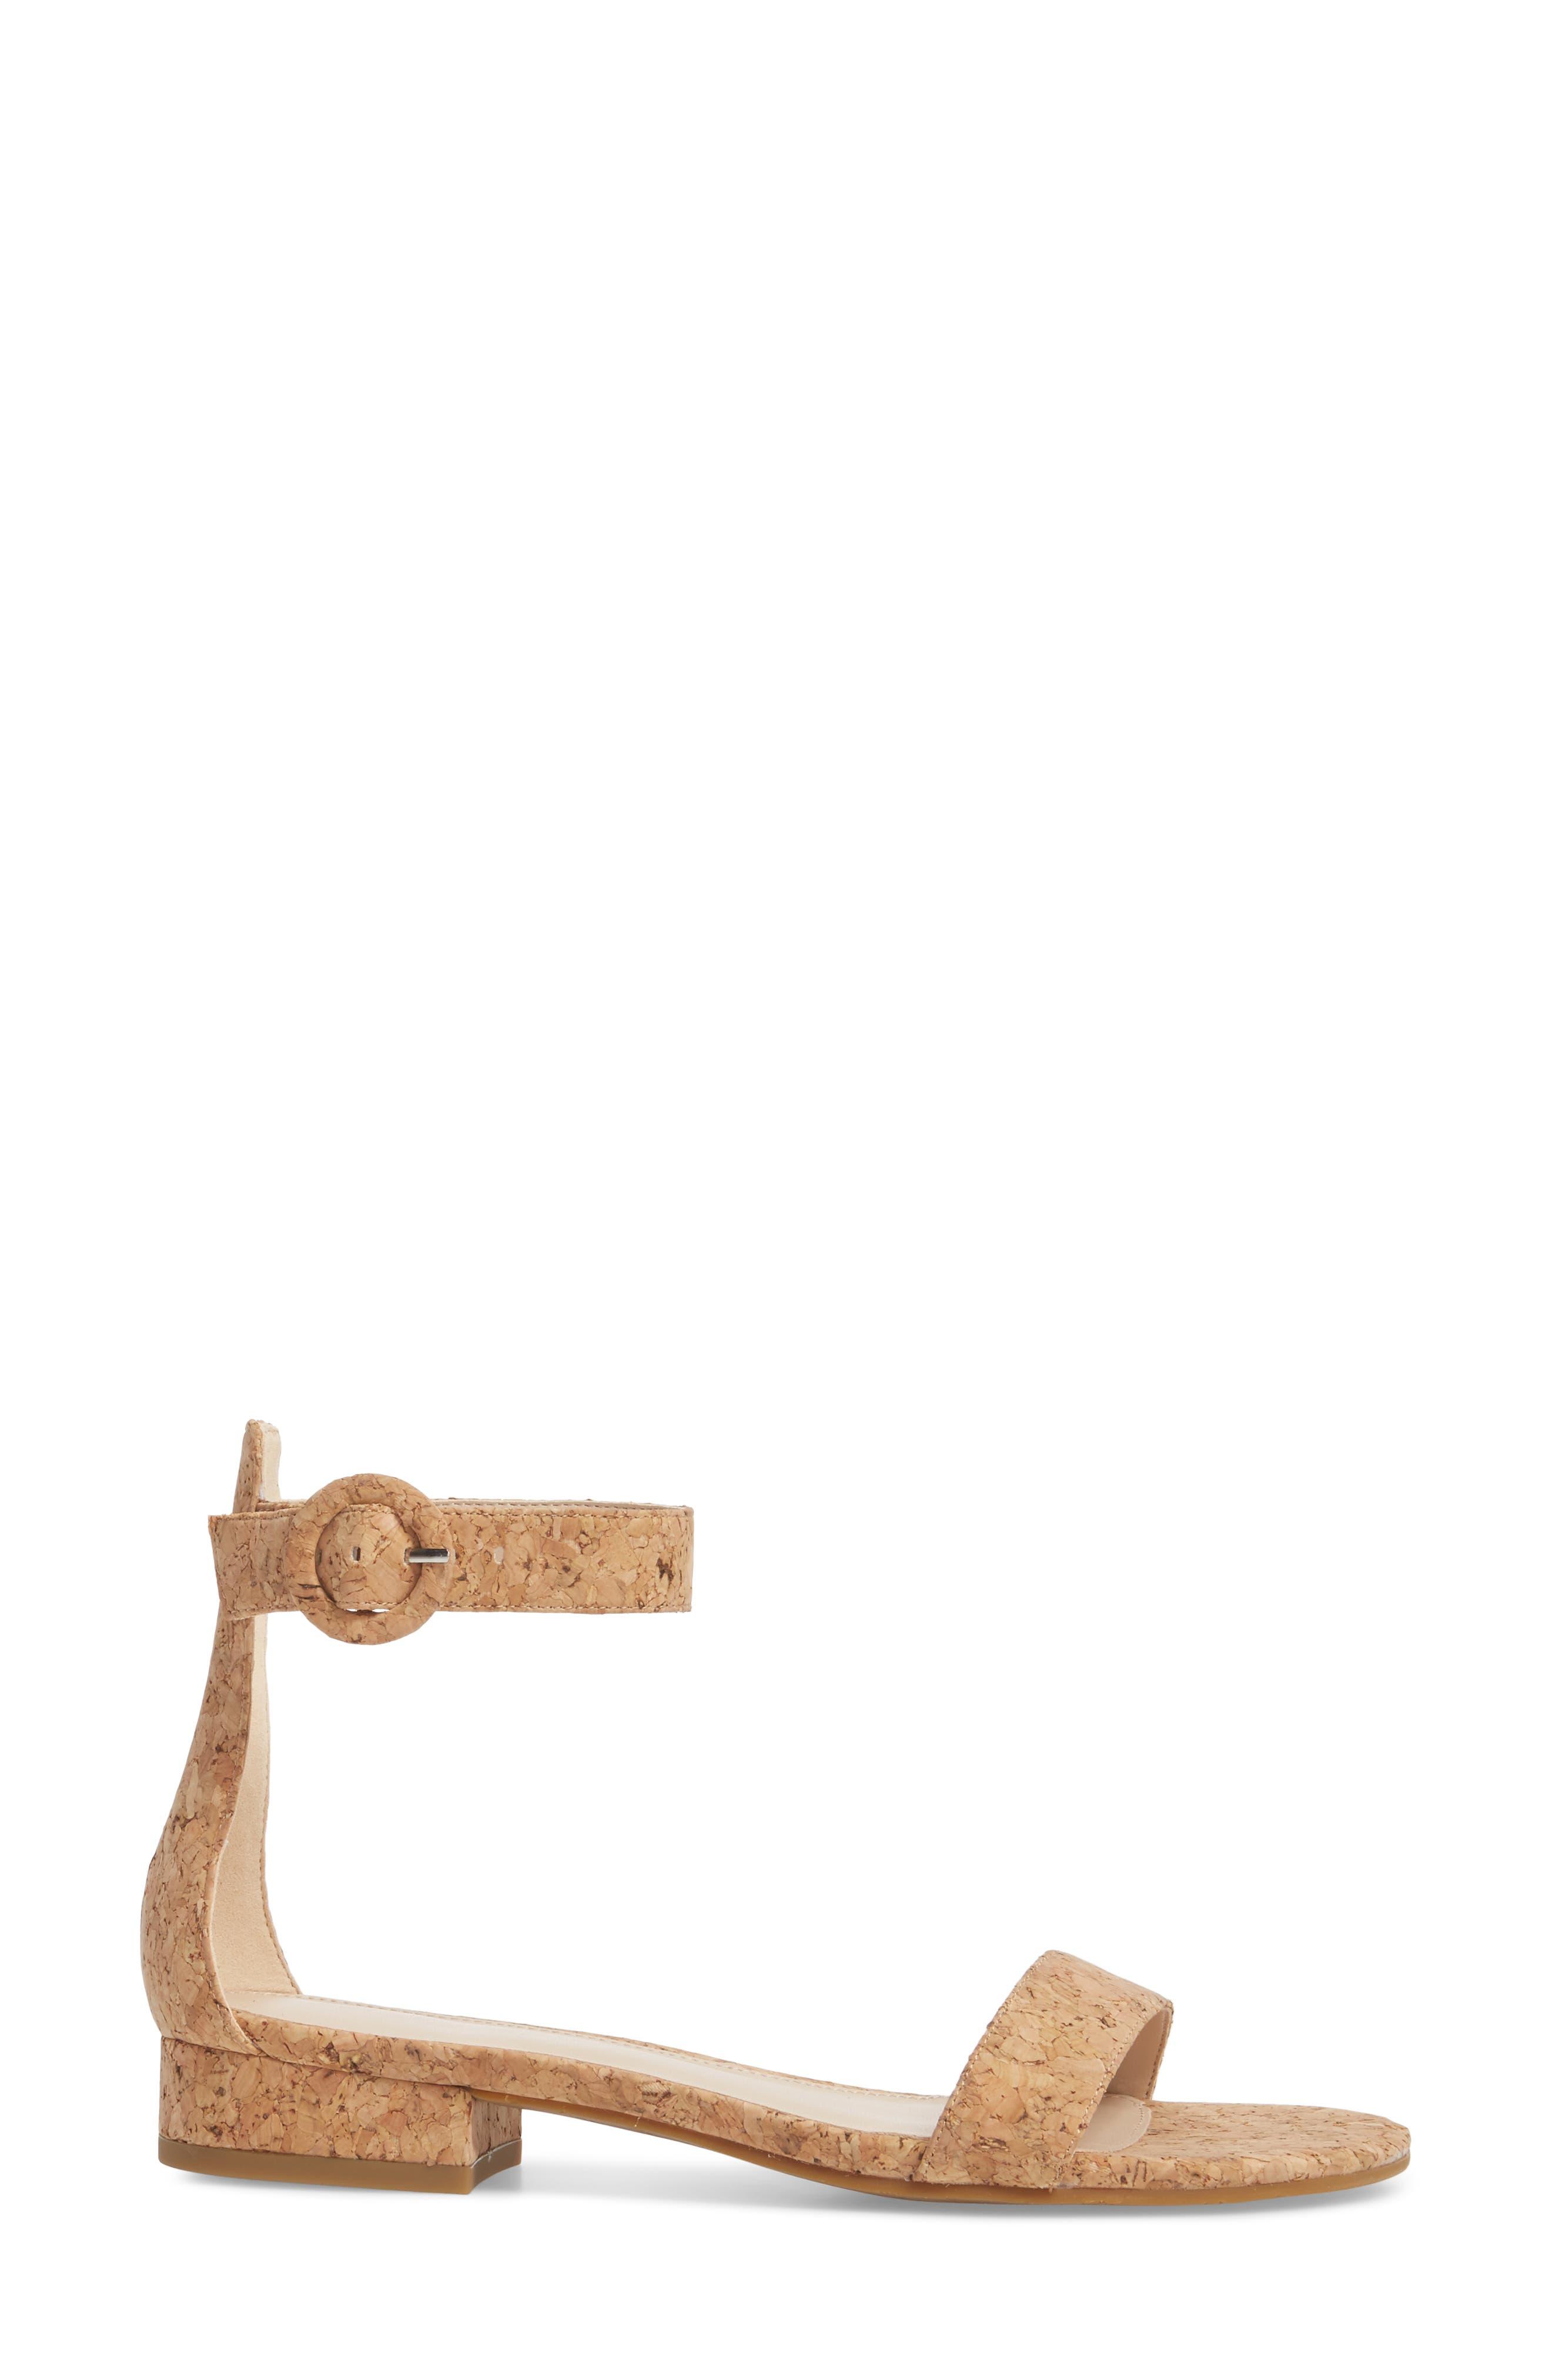 Newport Sandal,                             Alternate thumbnail 3, color,                             NATURAL CORK